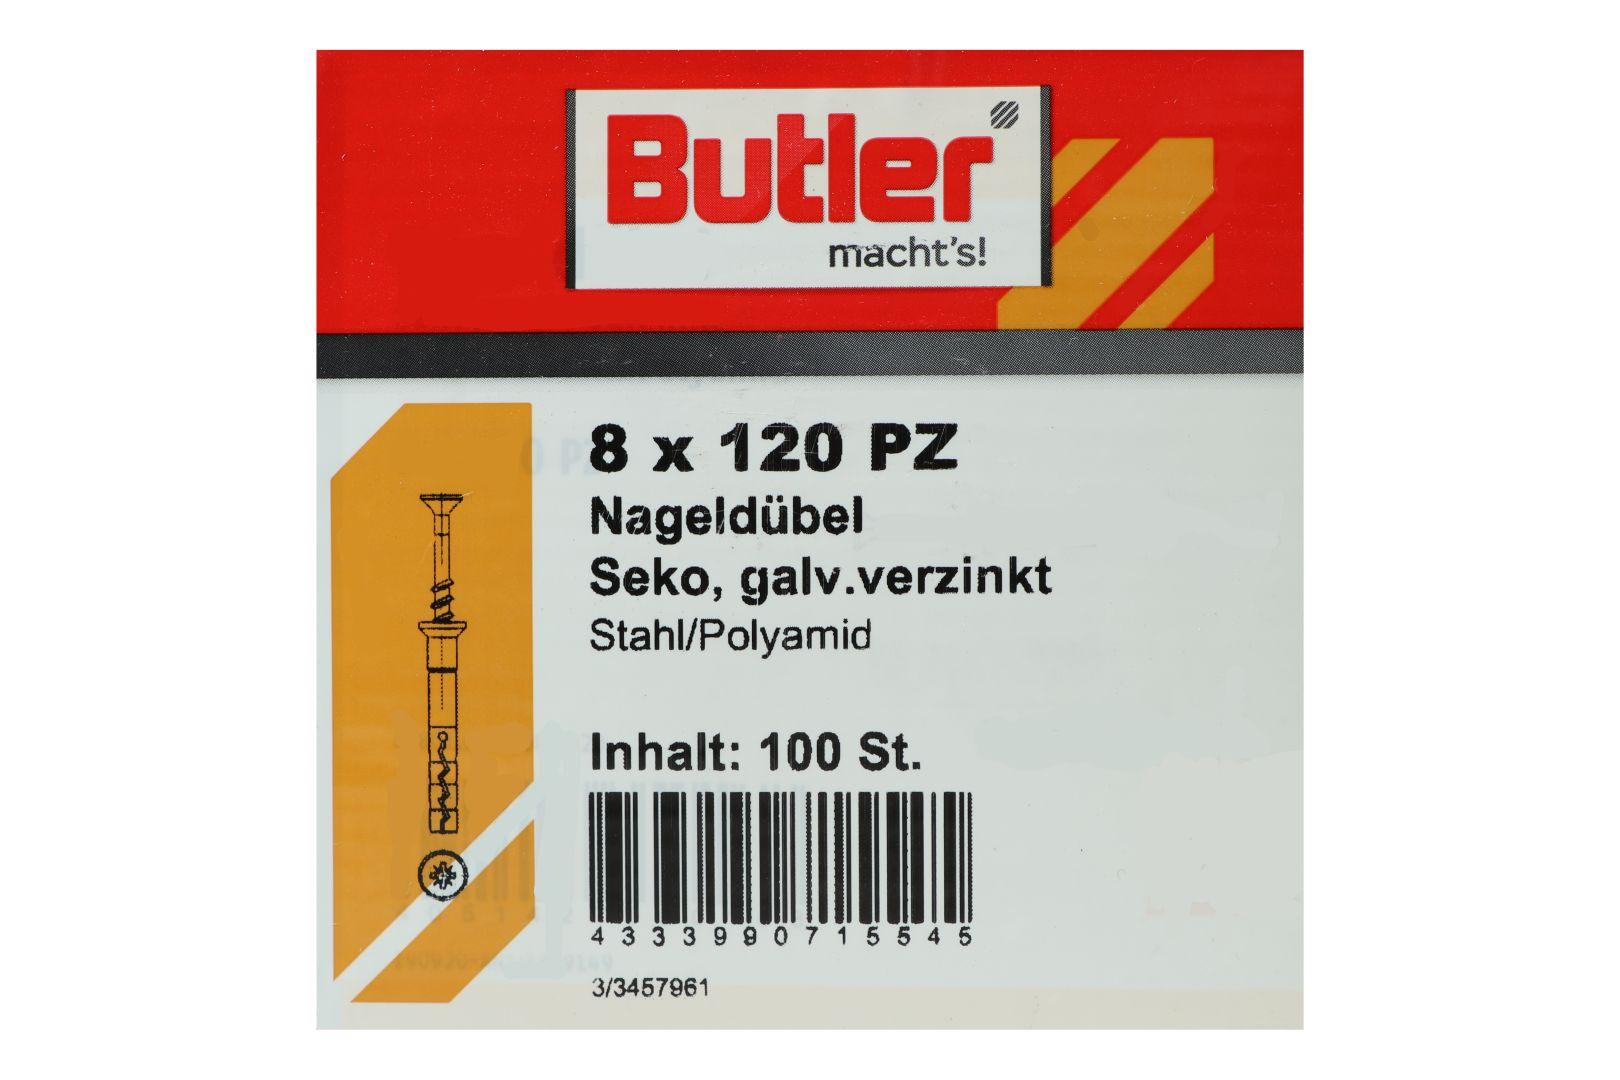 Butler macht's! Nageldübel, Stahl / Polyamid, Senkkopf, galvanisch verzinkt 8 x 120 mm, 100 Stück